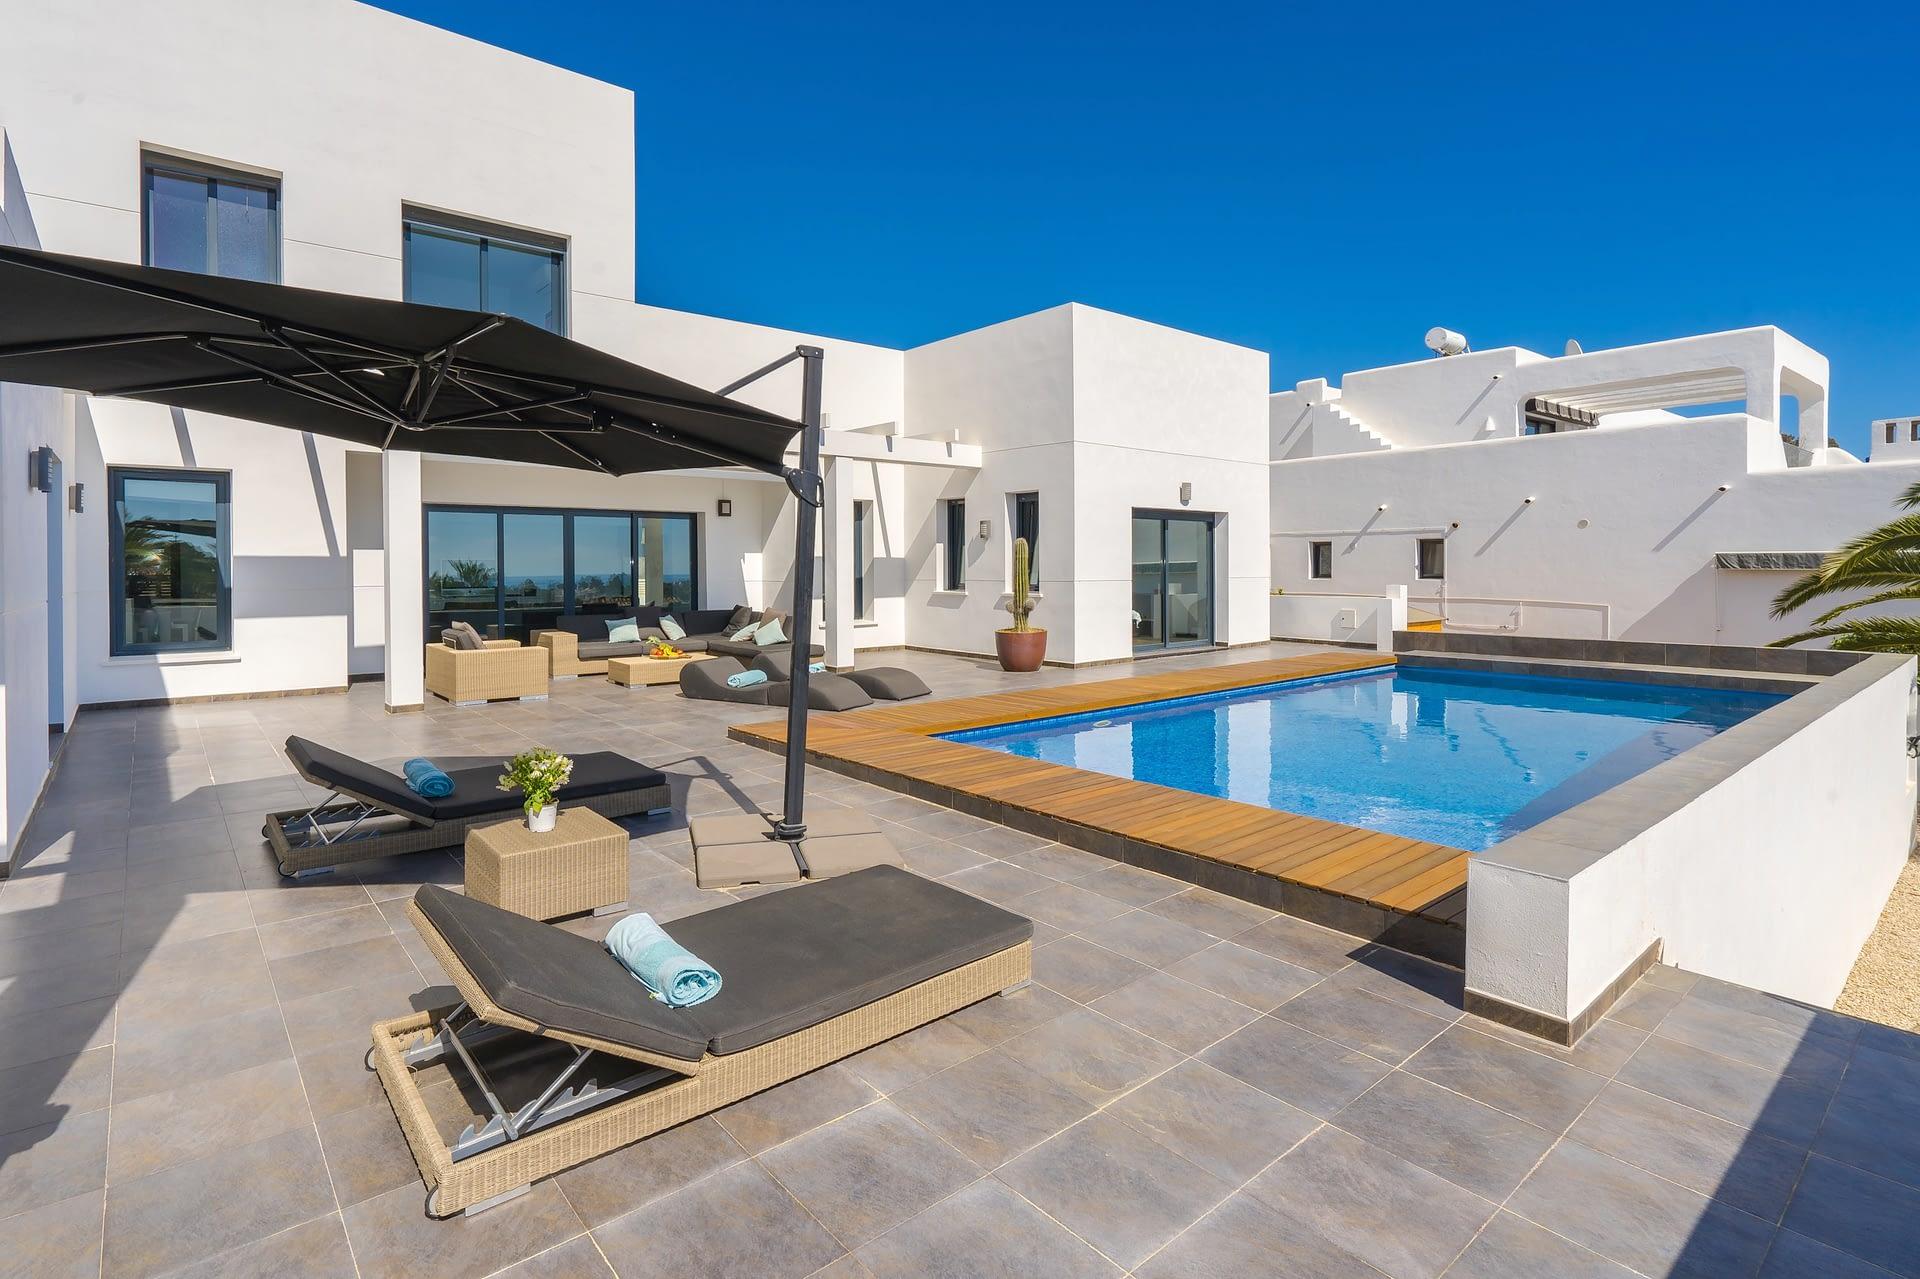 Pierluigi Cavarra - fotografo de Inmobiliaria - real estate photography costa blanca - ejemplo14